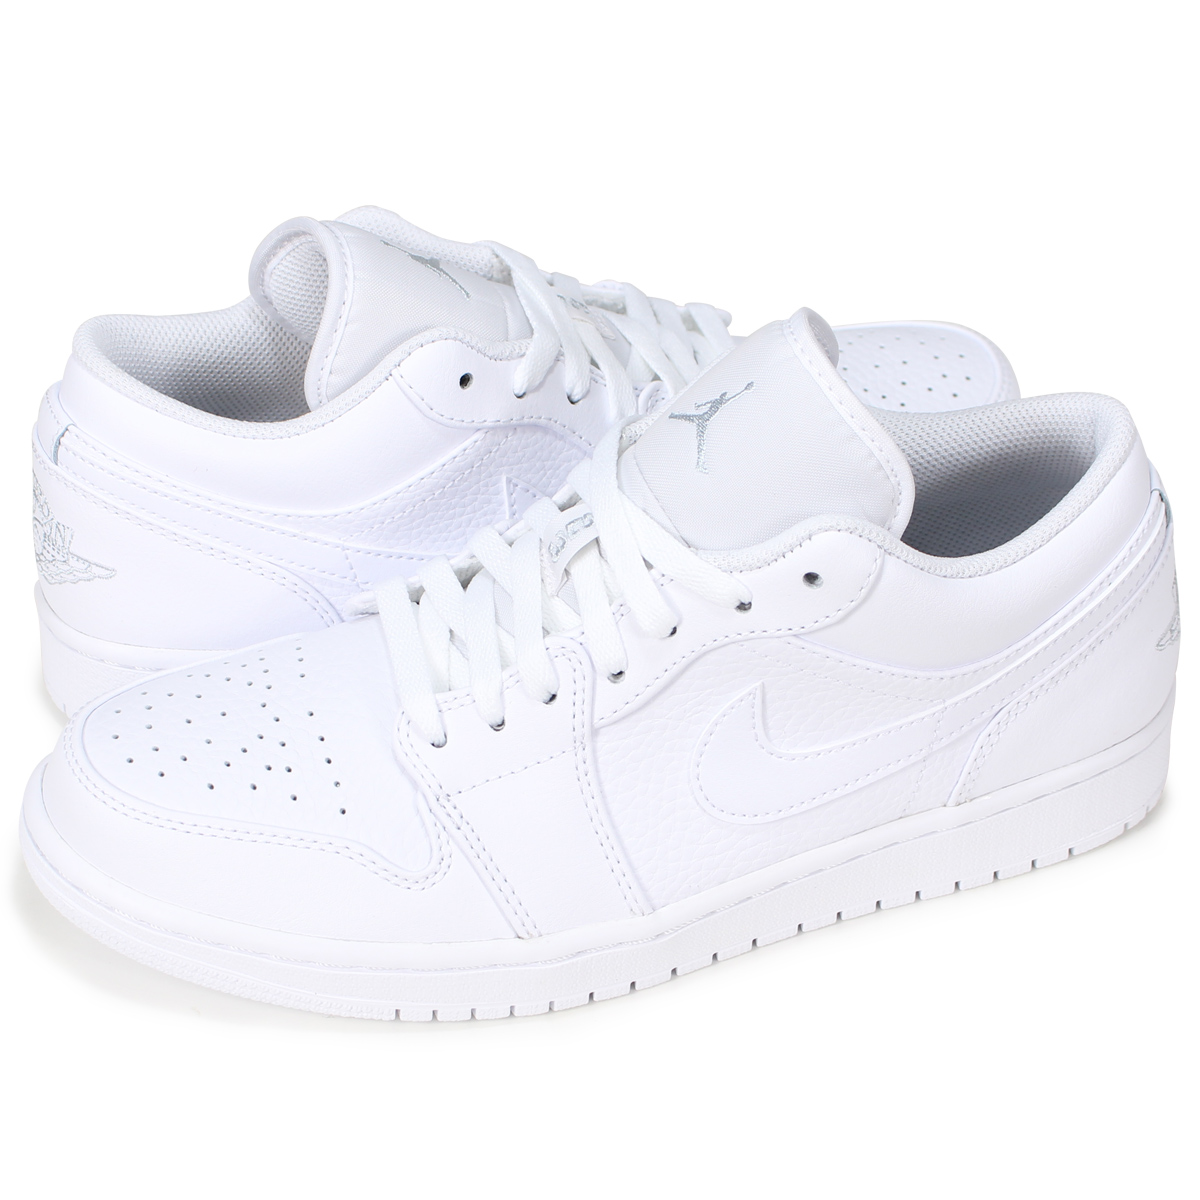 Air Nike Product Jordan 553 109 713 Containing 1 Planned Sneakers Men Whiteload In Low Shinnyu Reservation Load 558 b7IYy6vfg